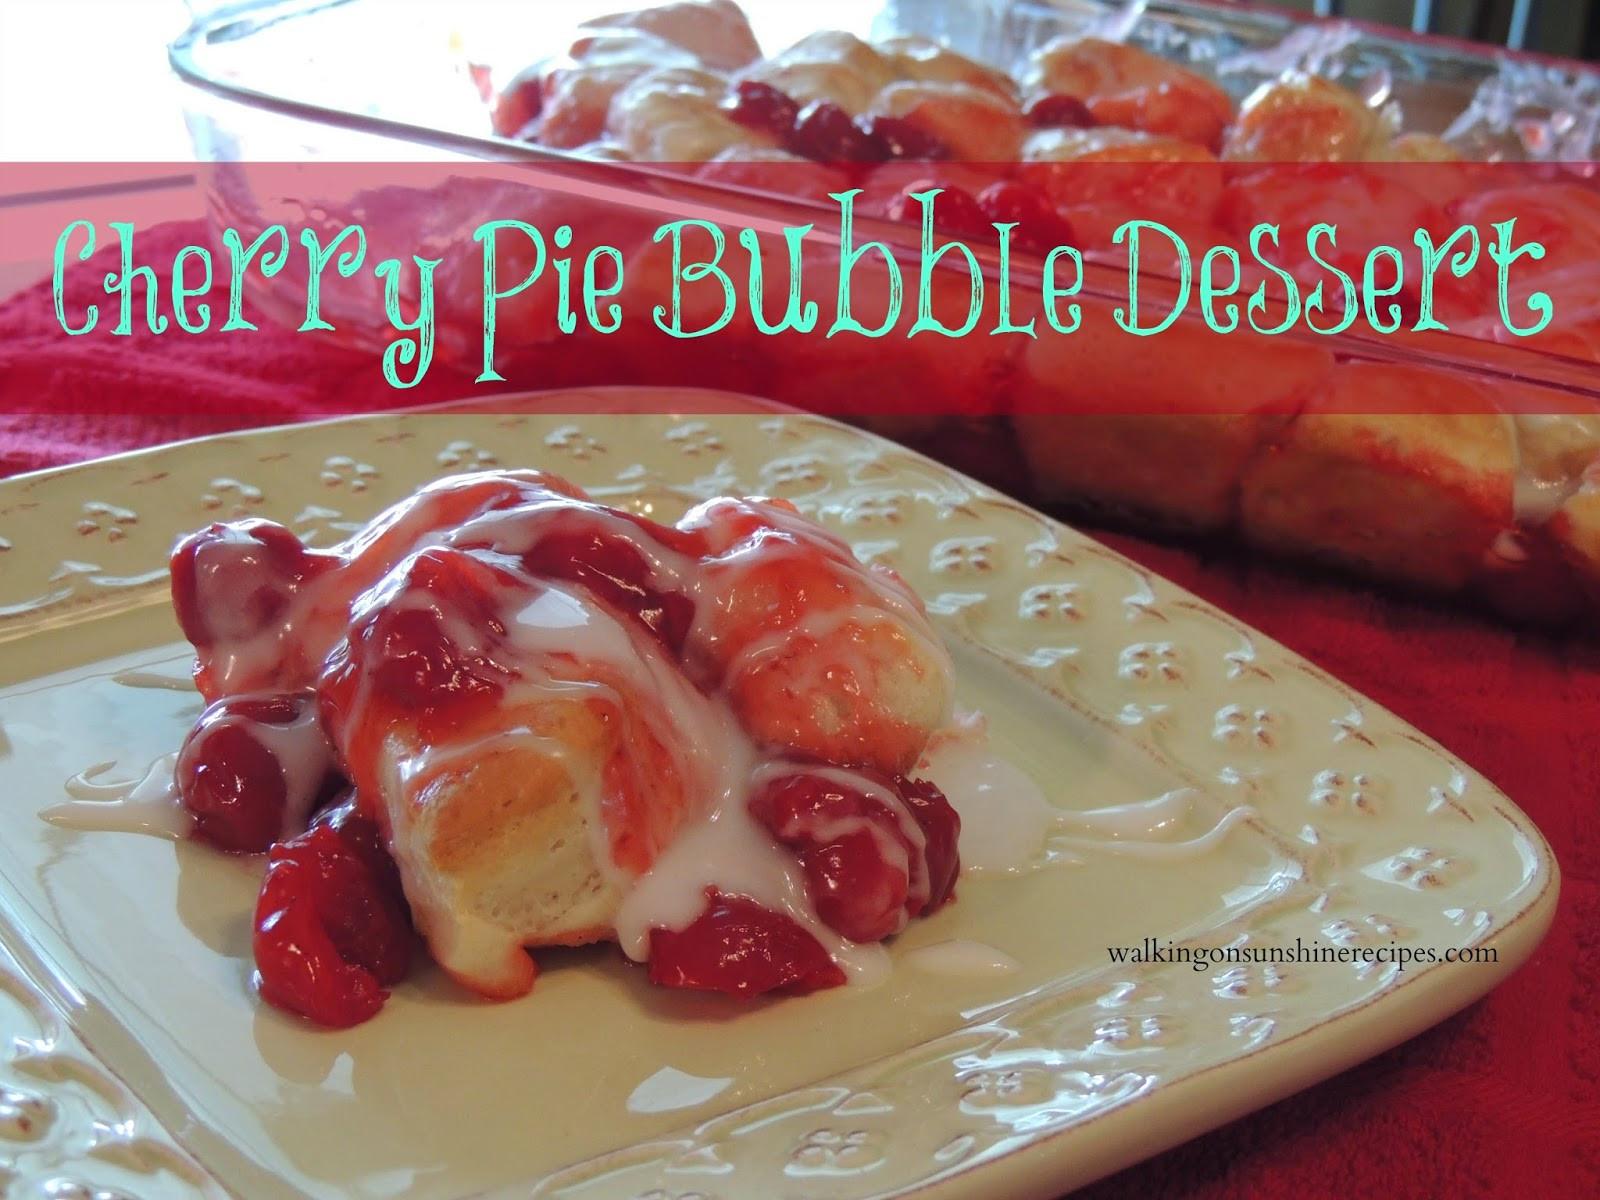 Cherry Pie Filling Desserts  Cherry Pie Bubble Dessert Walking on Sunshine